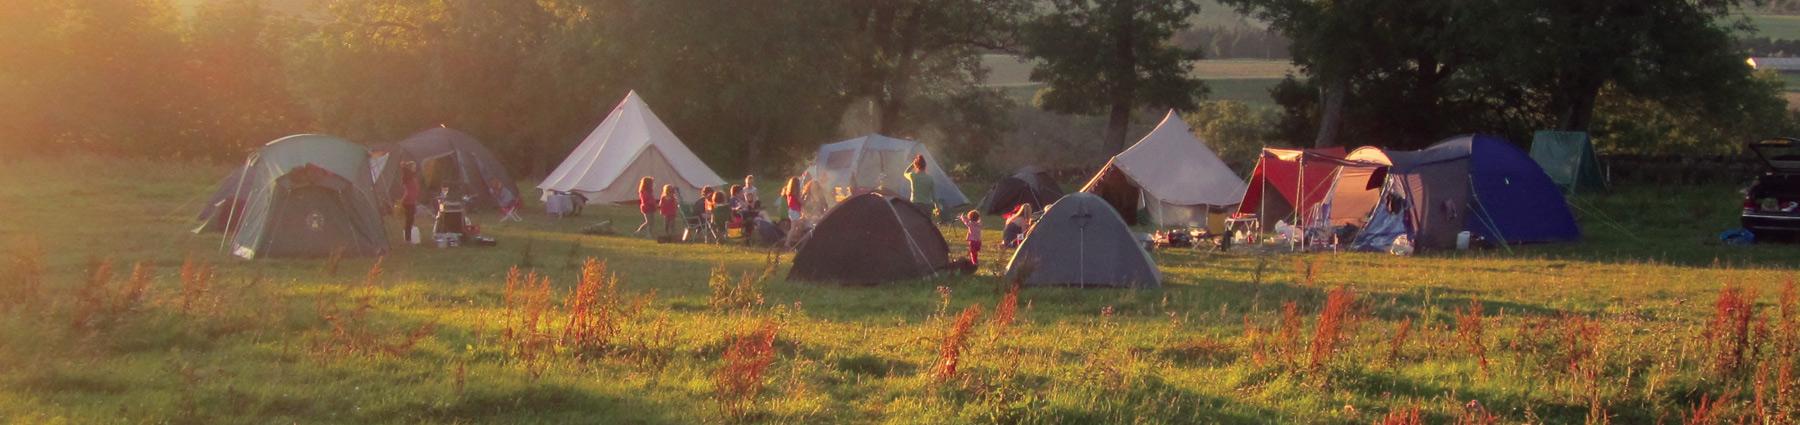 campingslide2